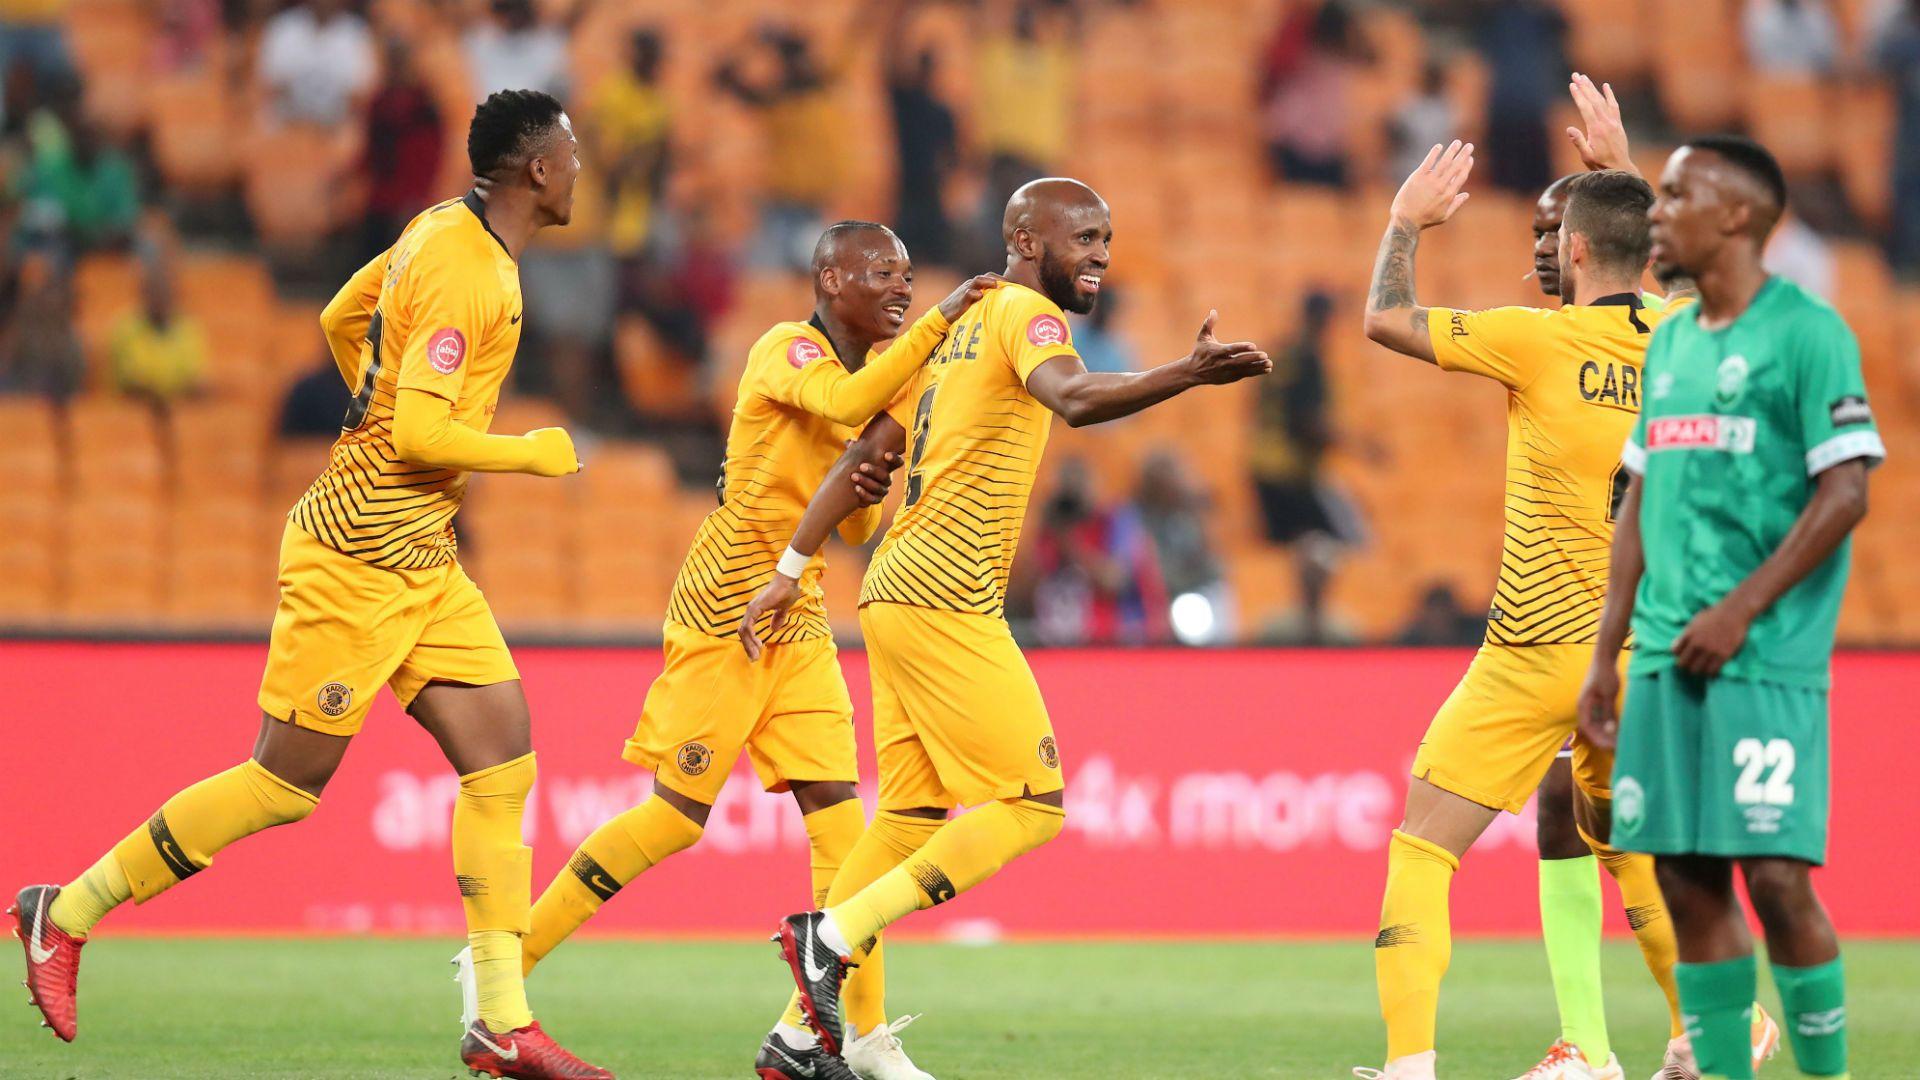 Kaizer Chiefs Ntshangase, Gordinho & players who need a move